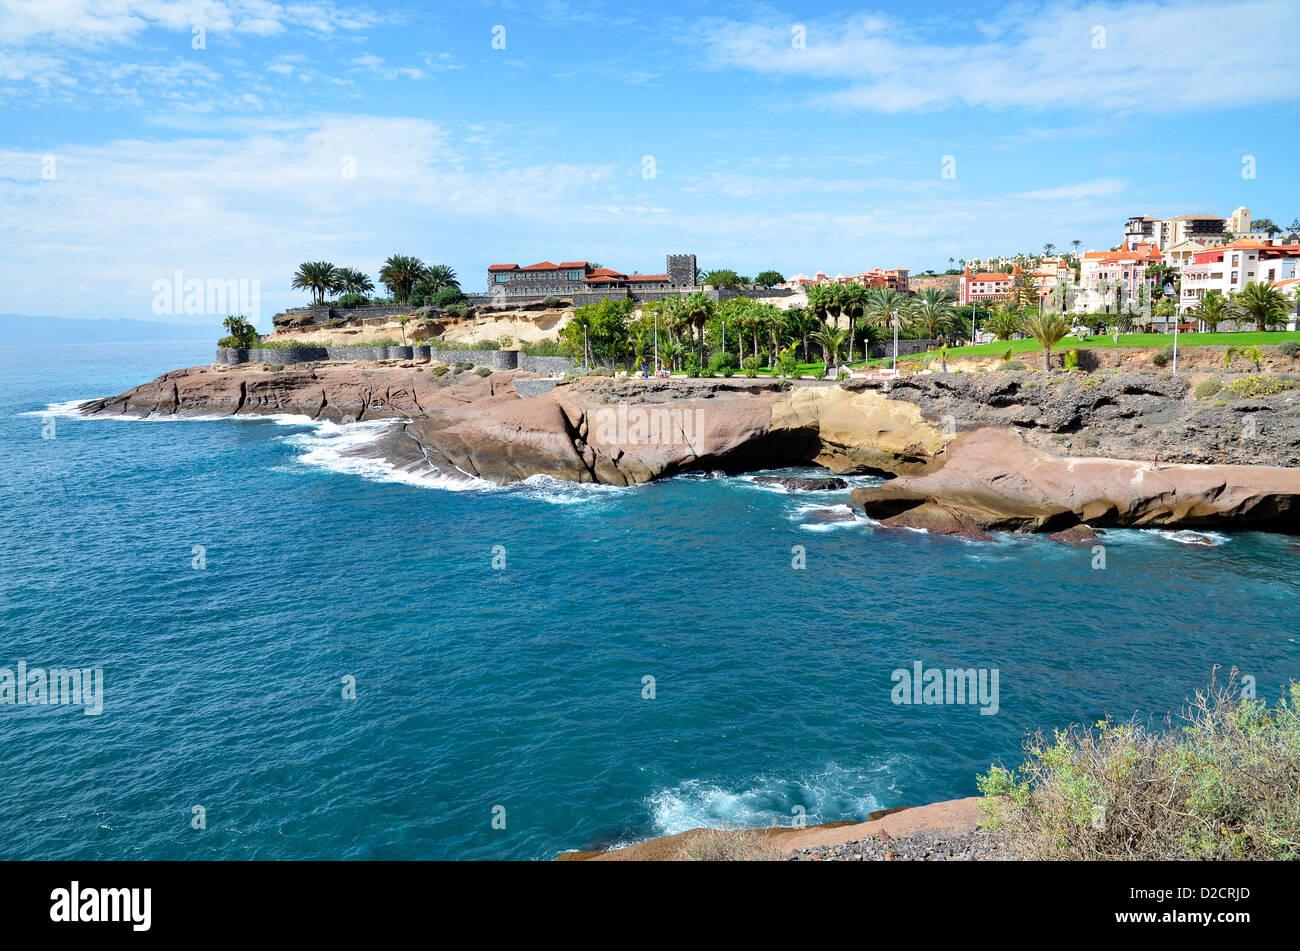 The coastline near Bahia Del Duque on the Costa Adeje in Tenerife, Canary Islands - Stock Image